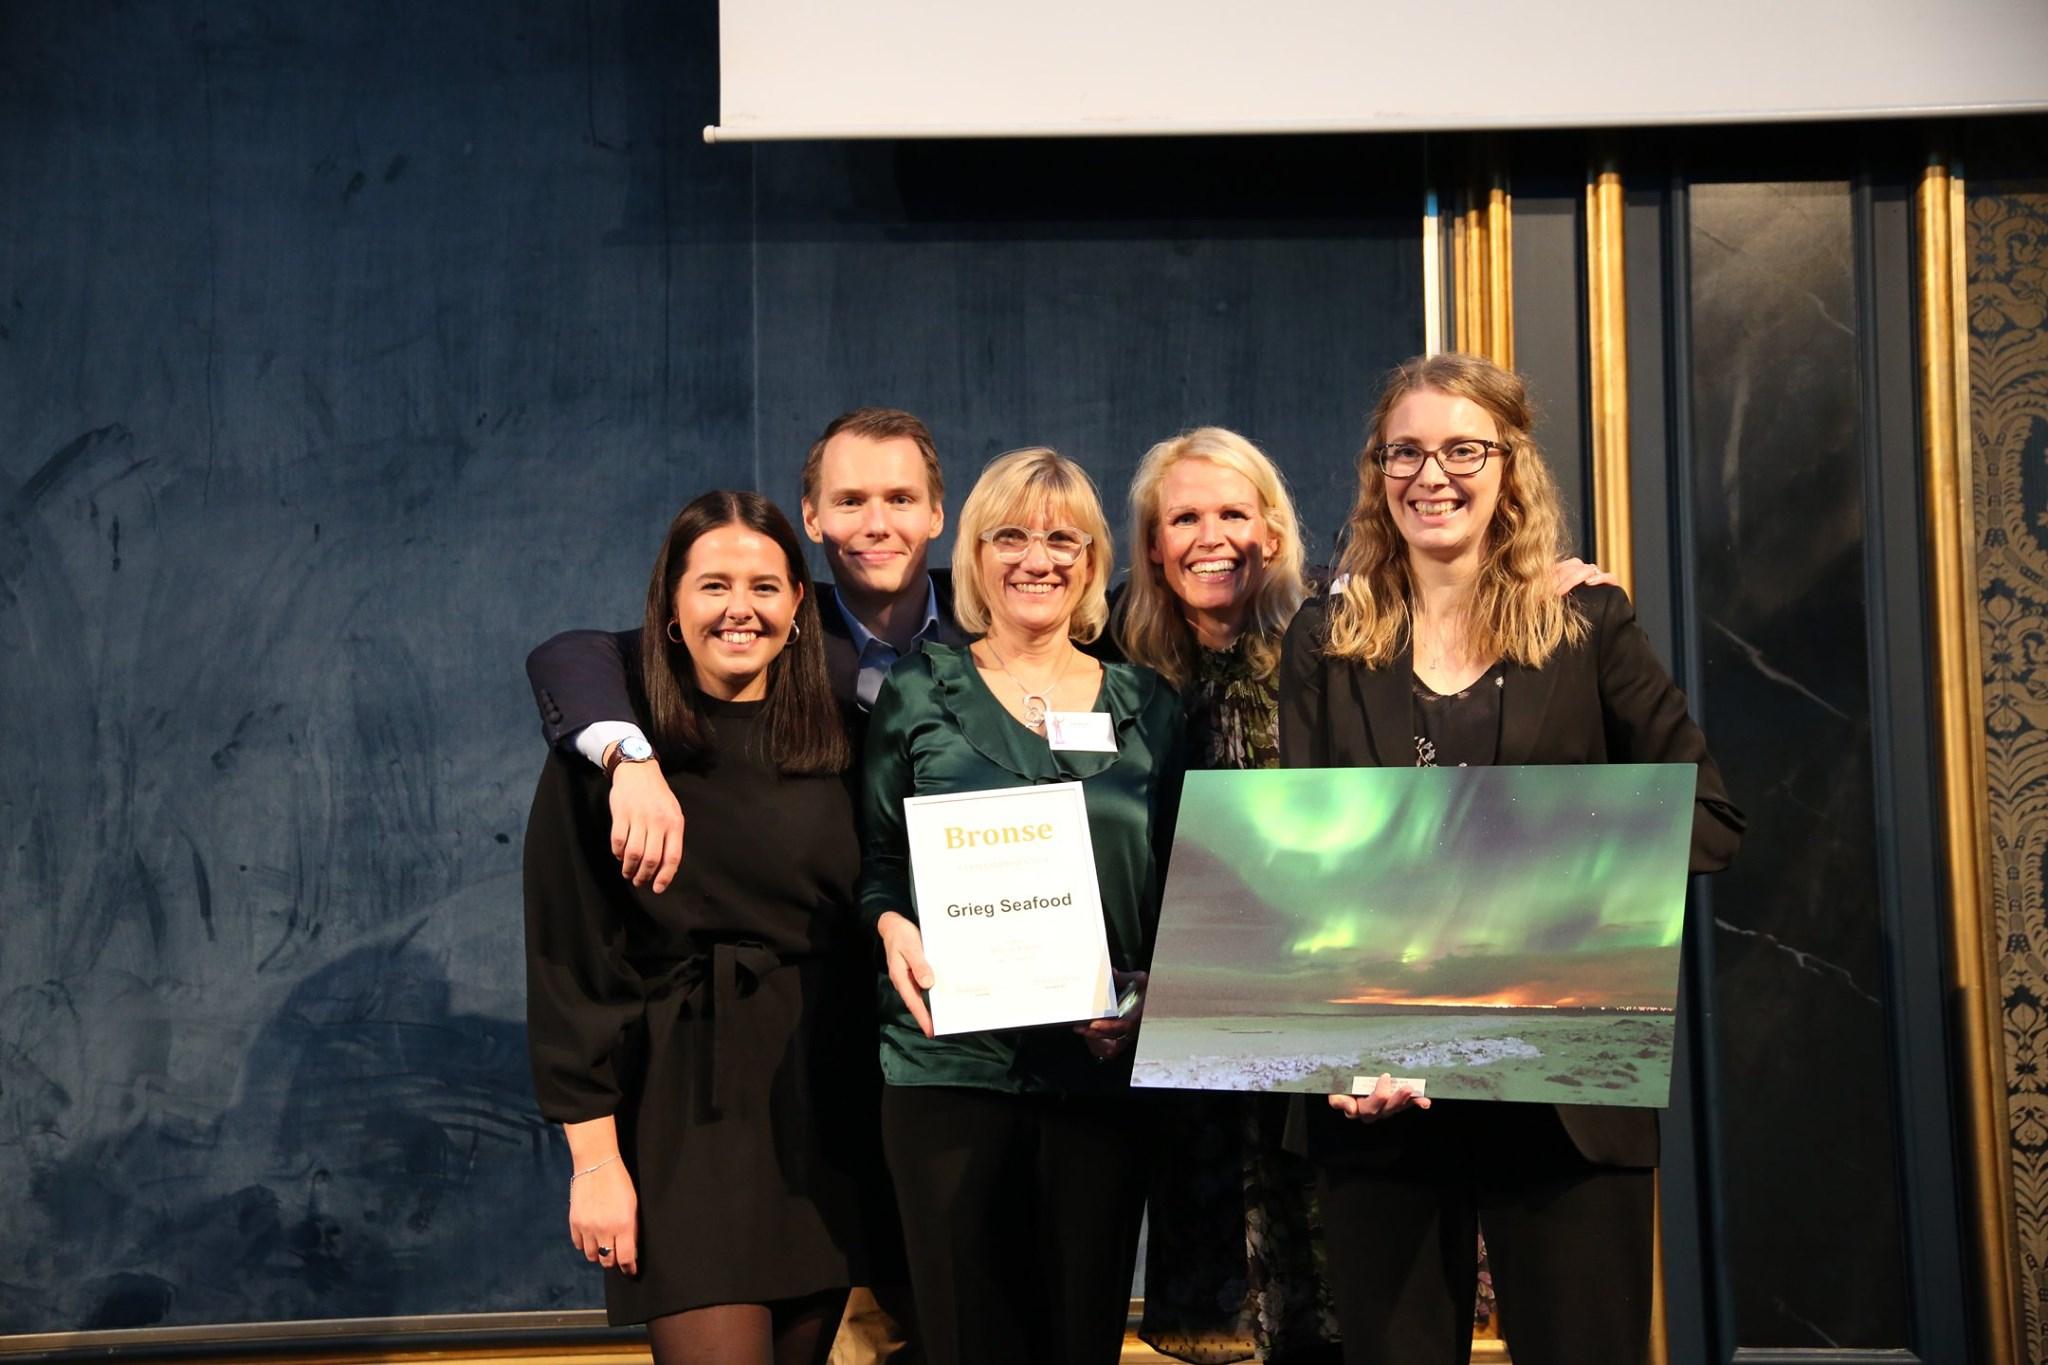 Årsrapport Ide & design - 3. plass Grieg Seafood